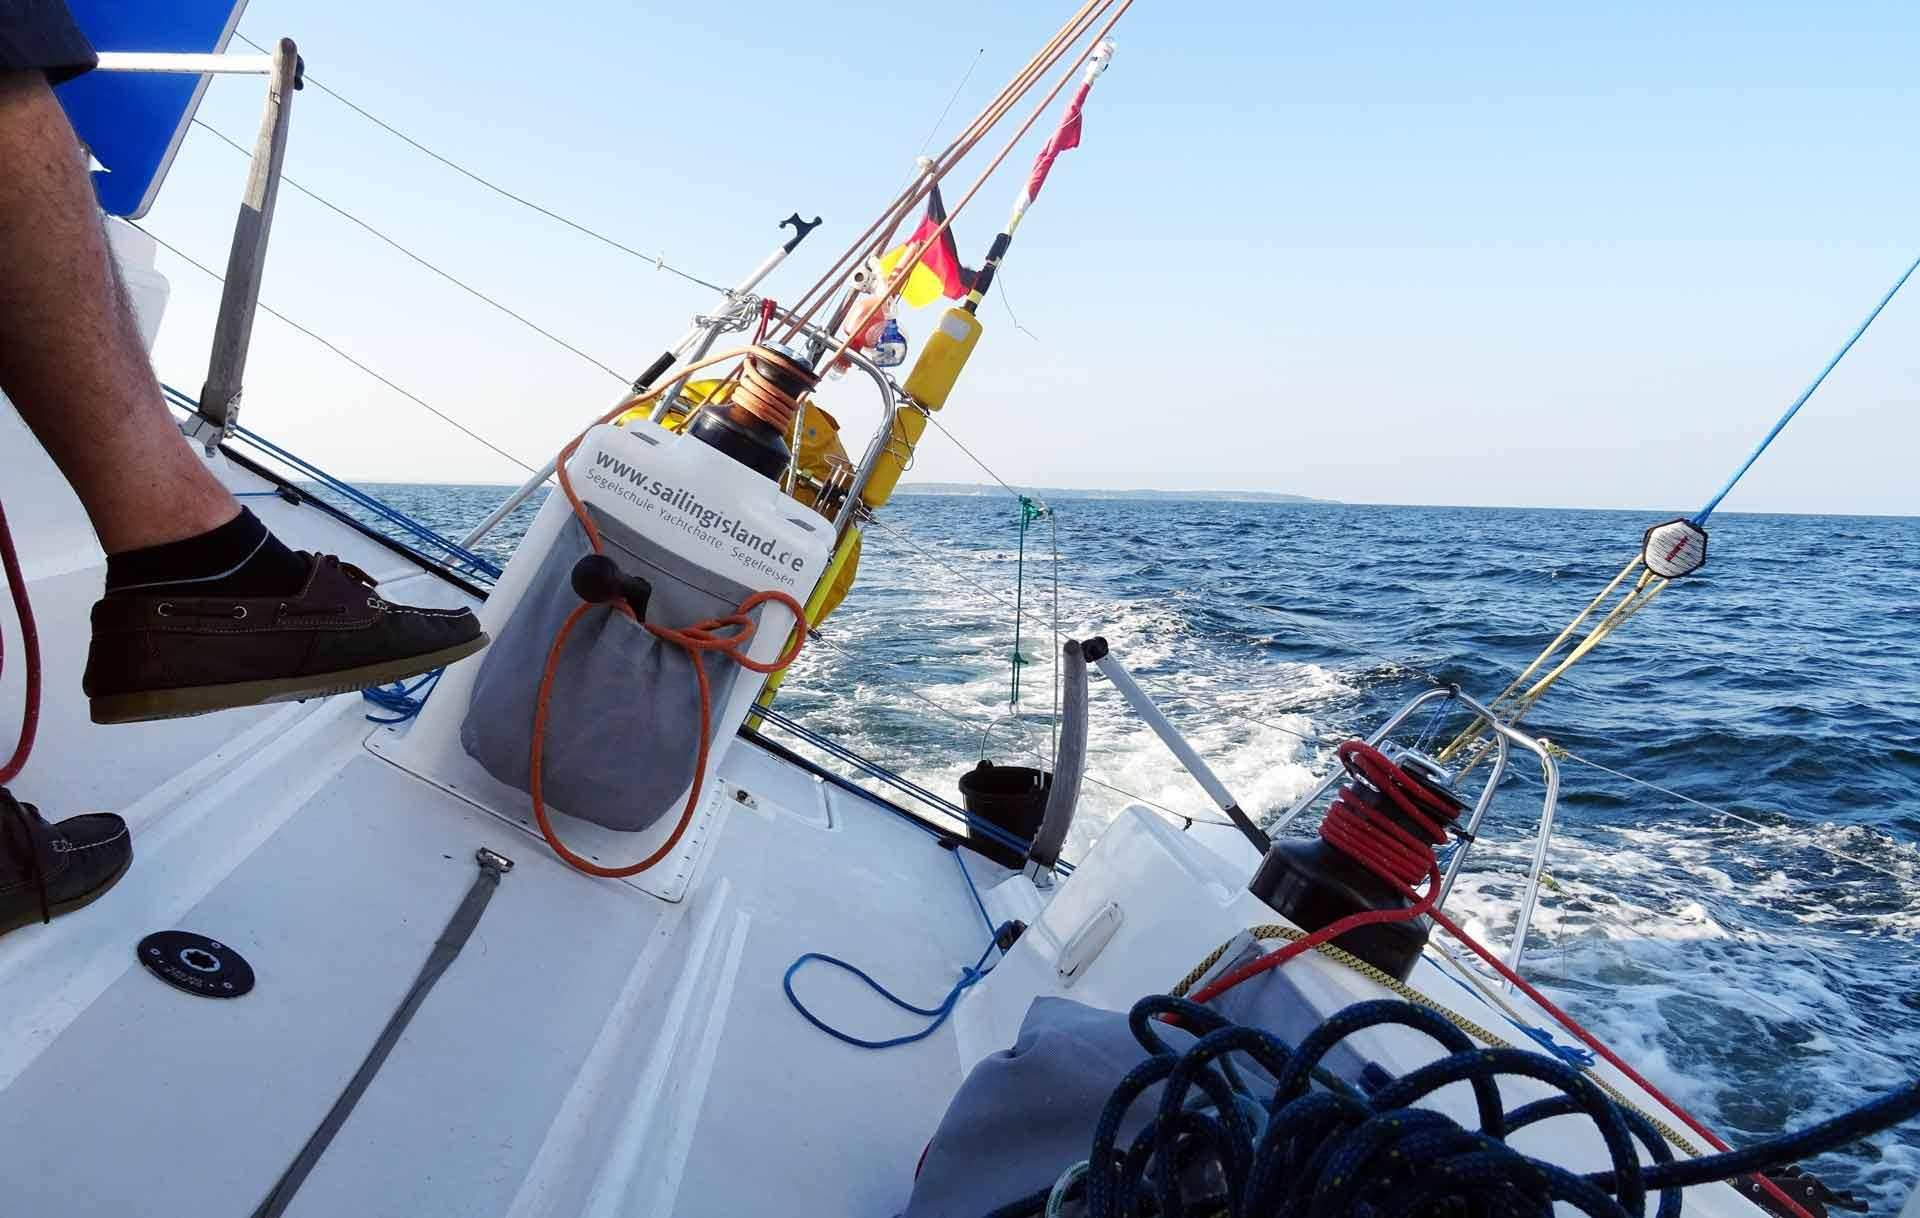 Pogo sailing action!